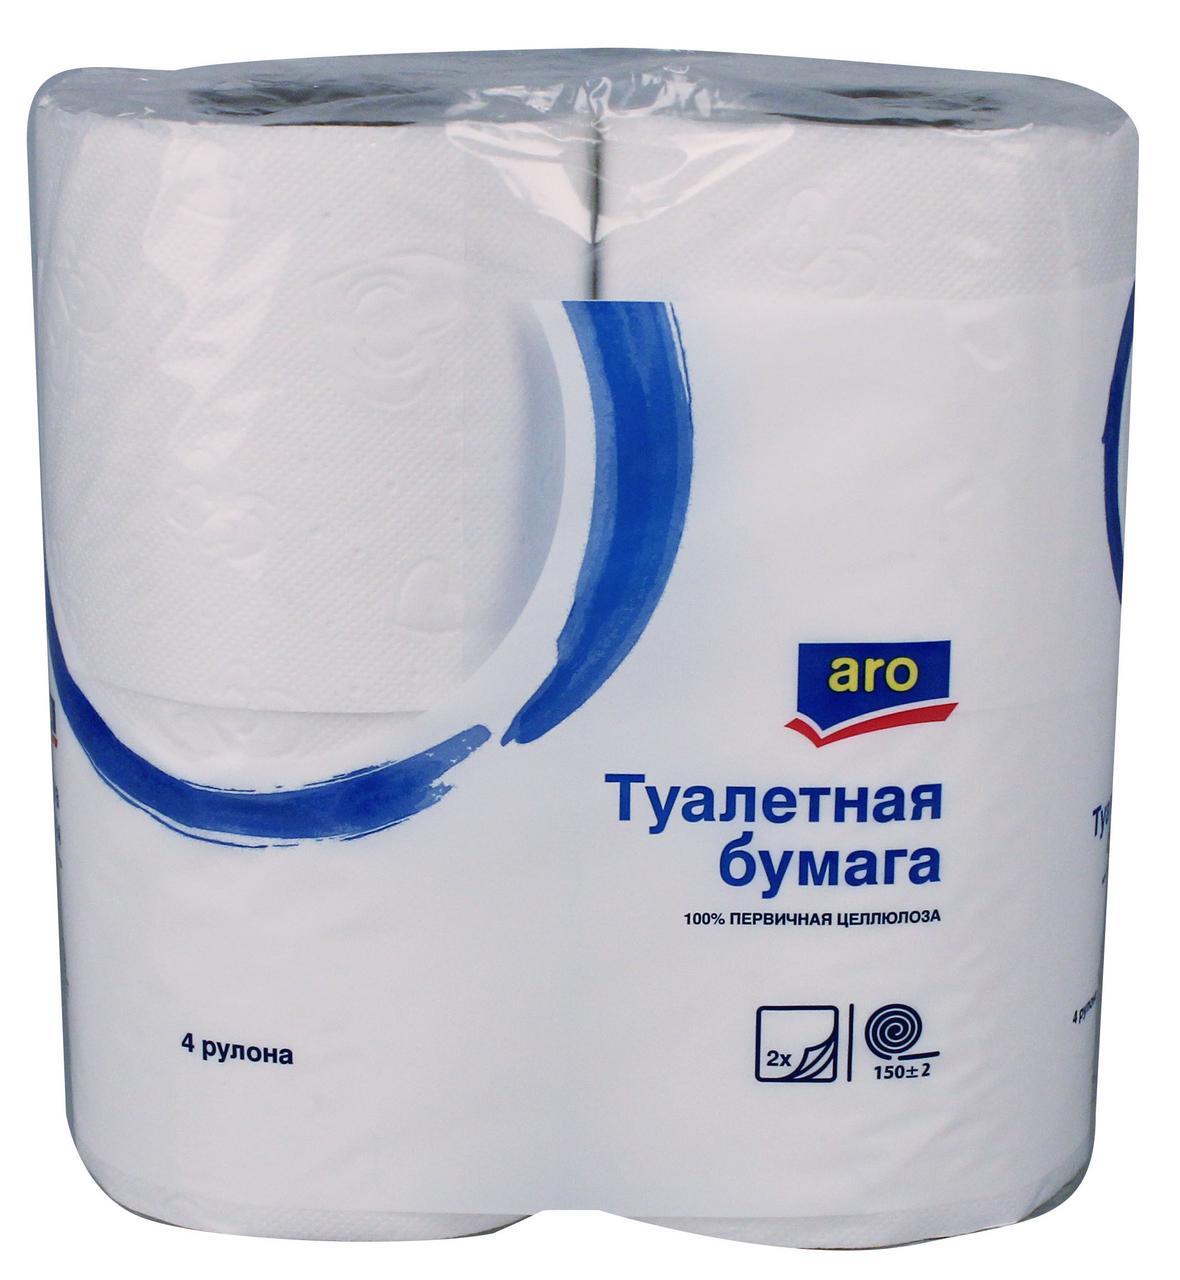 4ШТ ТУАЛ БУМ ARO 2-Х СЛ